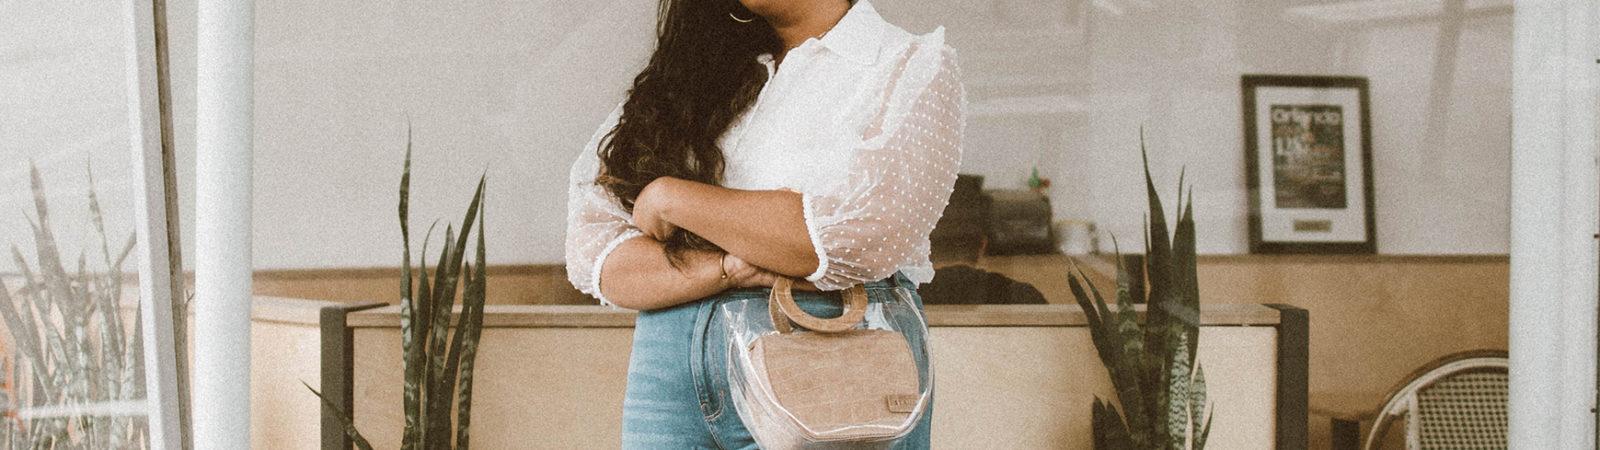 STAUD Handbags: Worth the Hype?